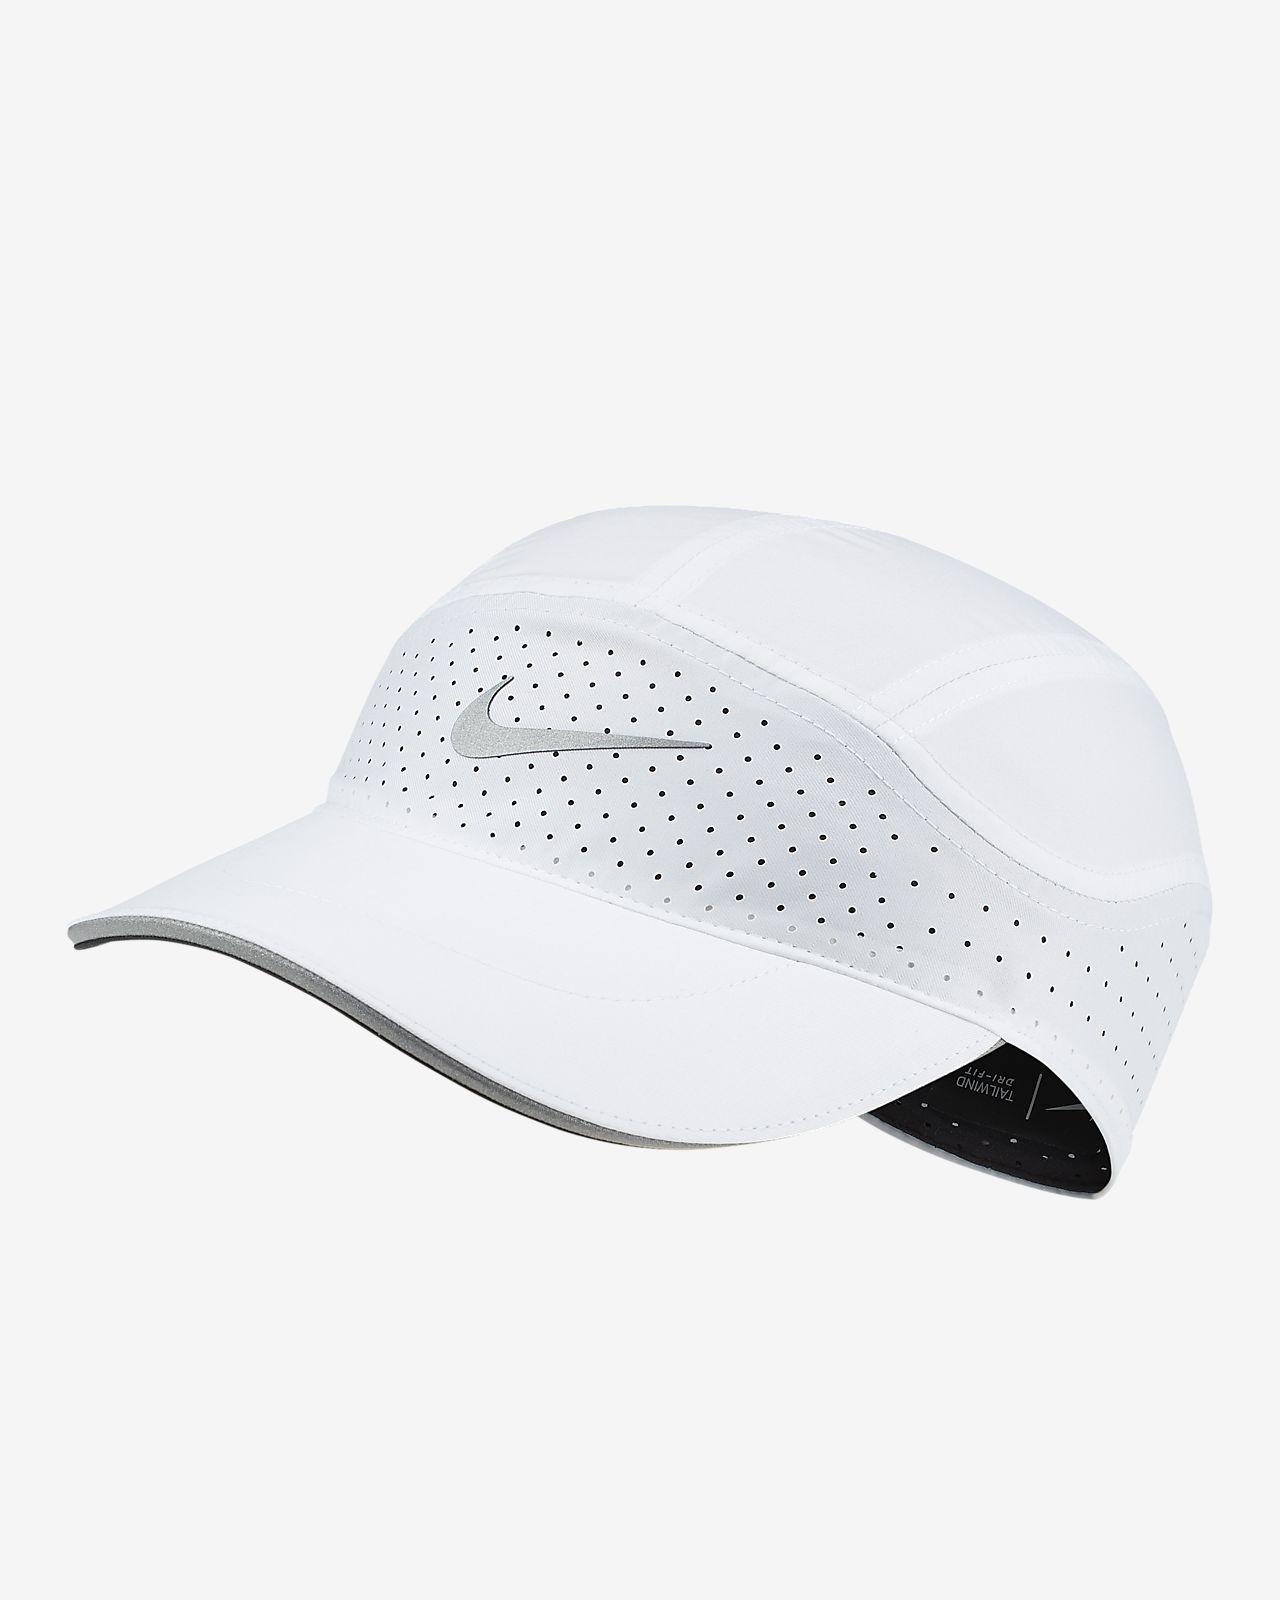 78f3b92adea24 Low Resolution Nike AeroBill Tailwind Running Cap Nike AeroBill Tailwind Running  Cap